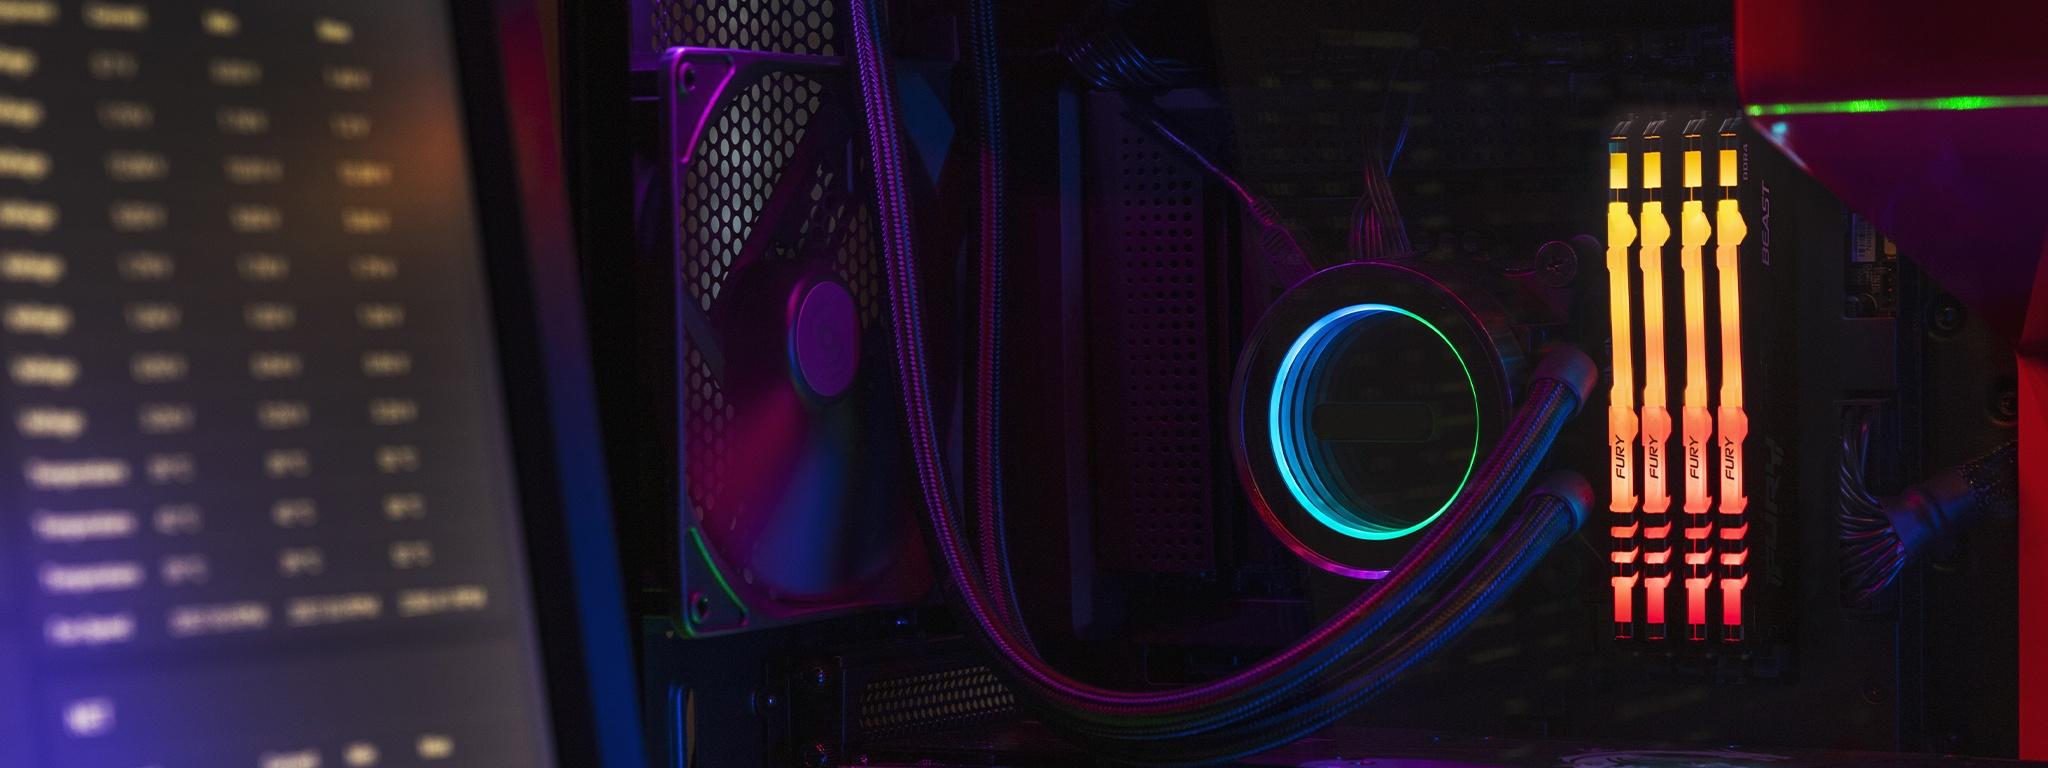 Kingston FURY Beast RGB와 CPU 냉각 팬, PC 사양 왼쪽의 모니터와 마더보드가 선으로 연결됨